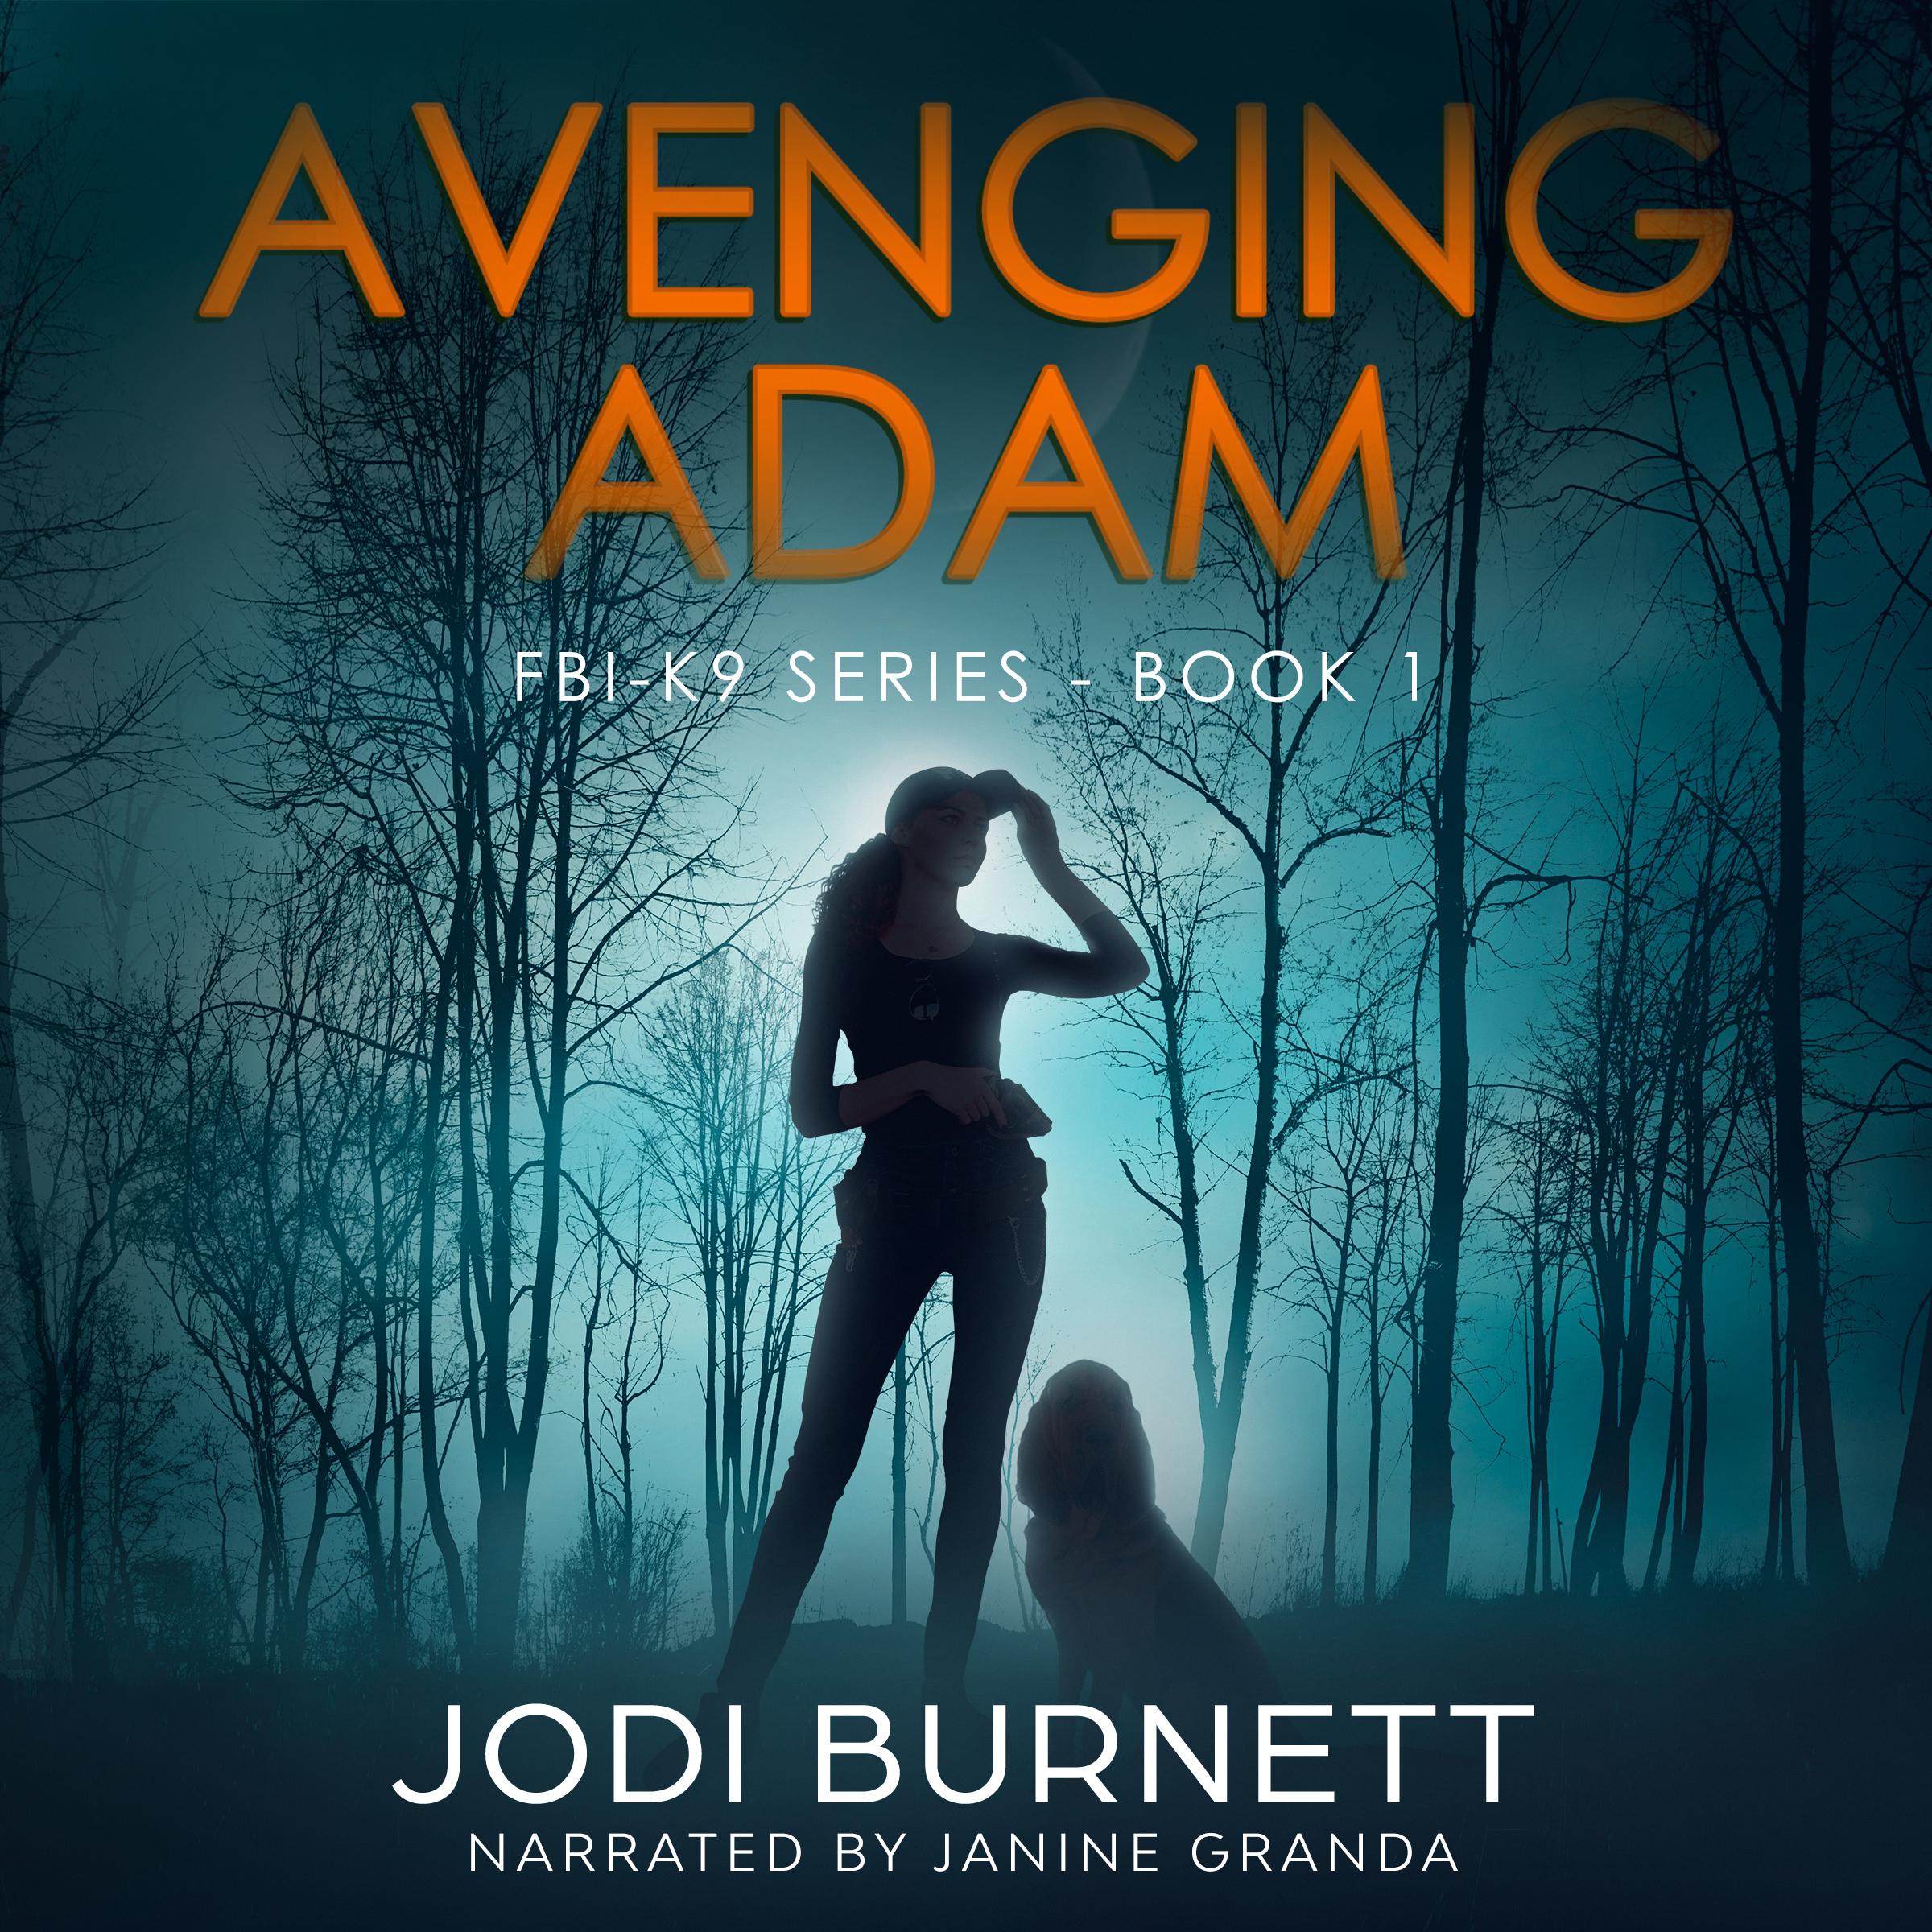 Avenging Adam (FBI-K9 #1) Audiobook